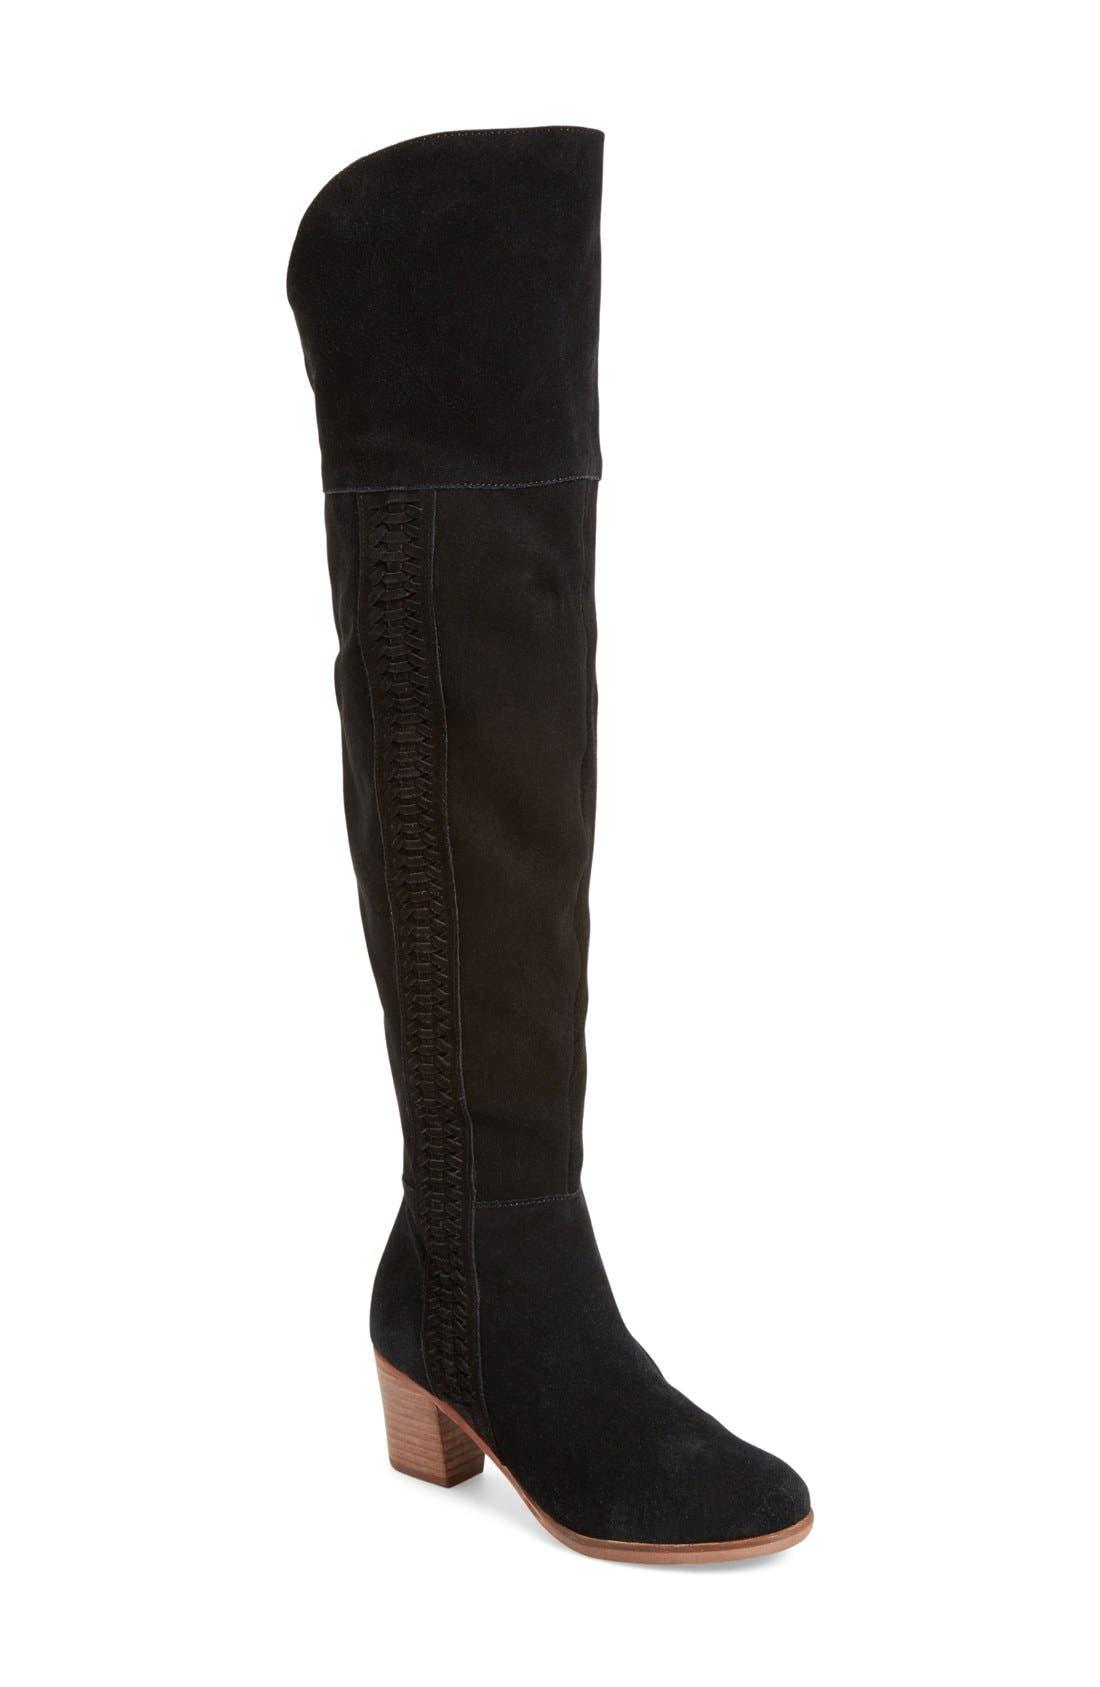 Main Image - Matisse Muse Tall Boot (Women) (Narrow Calf)